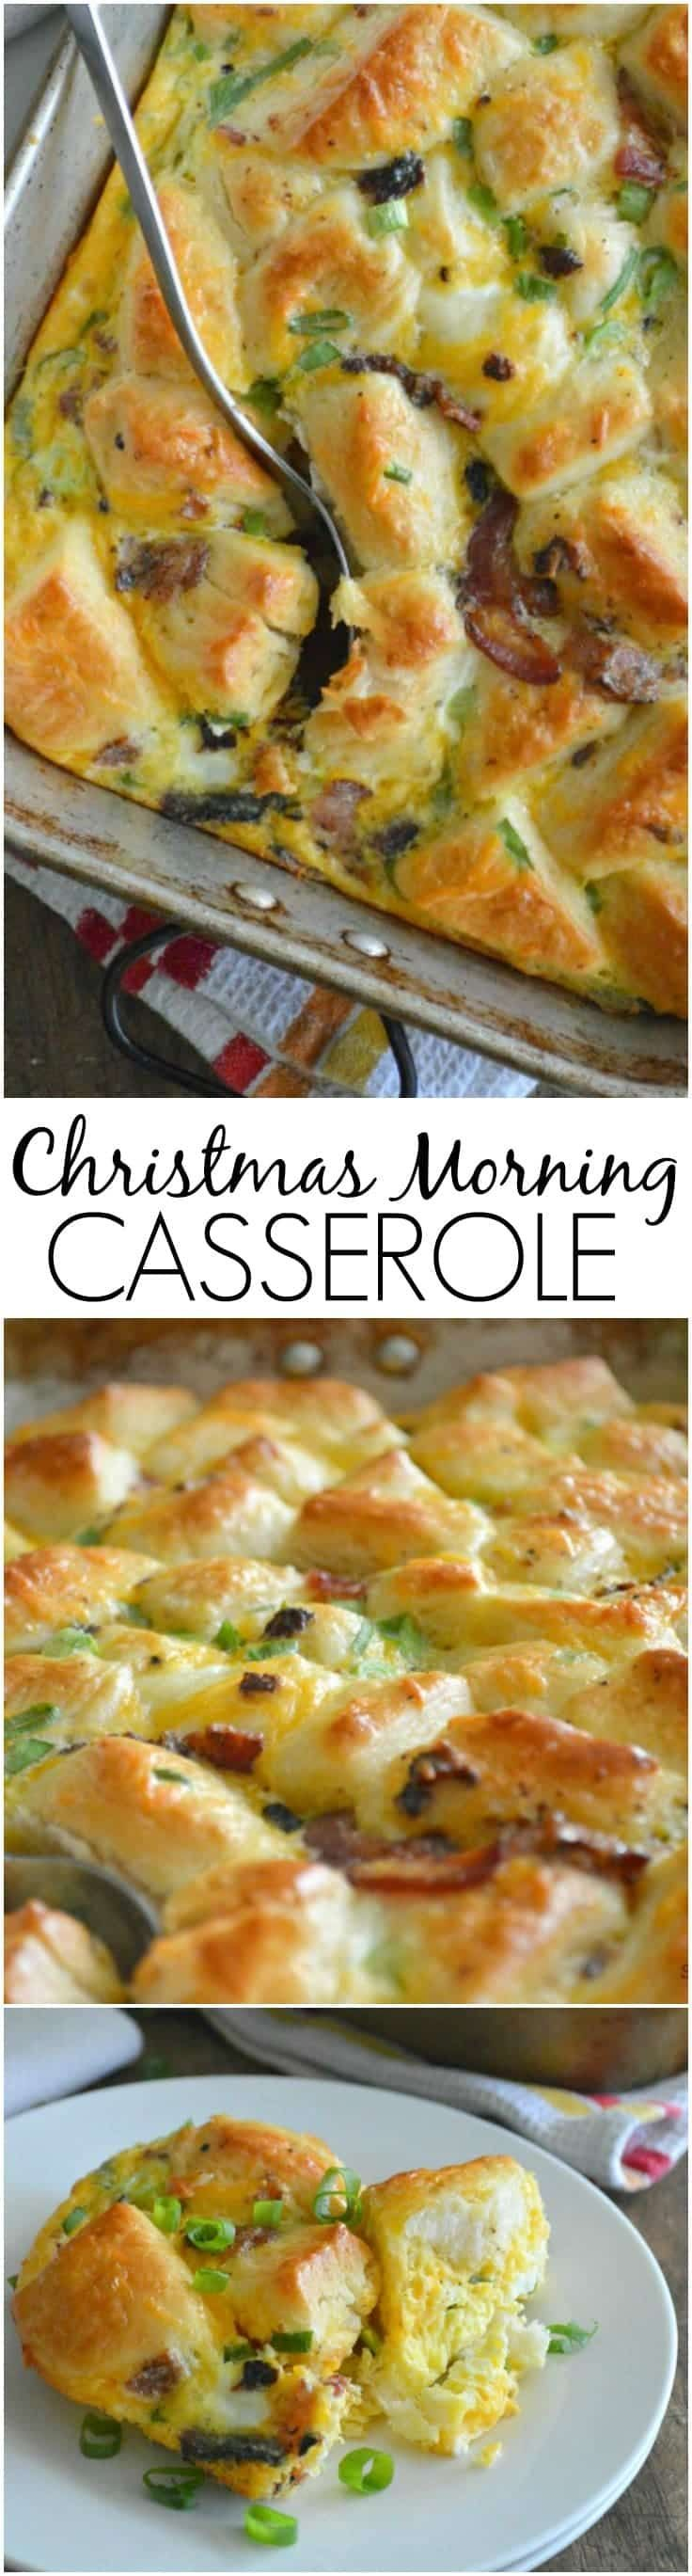 Christmas Morning Casserole